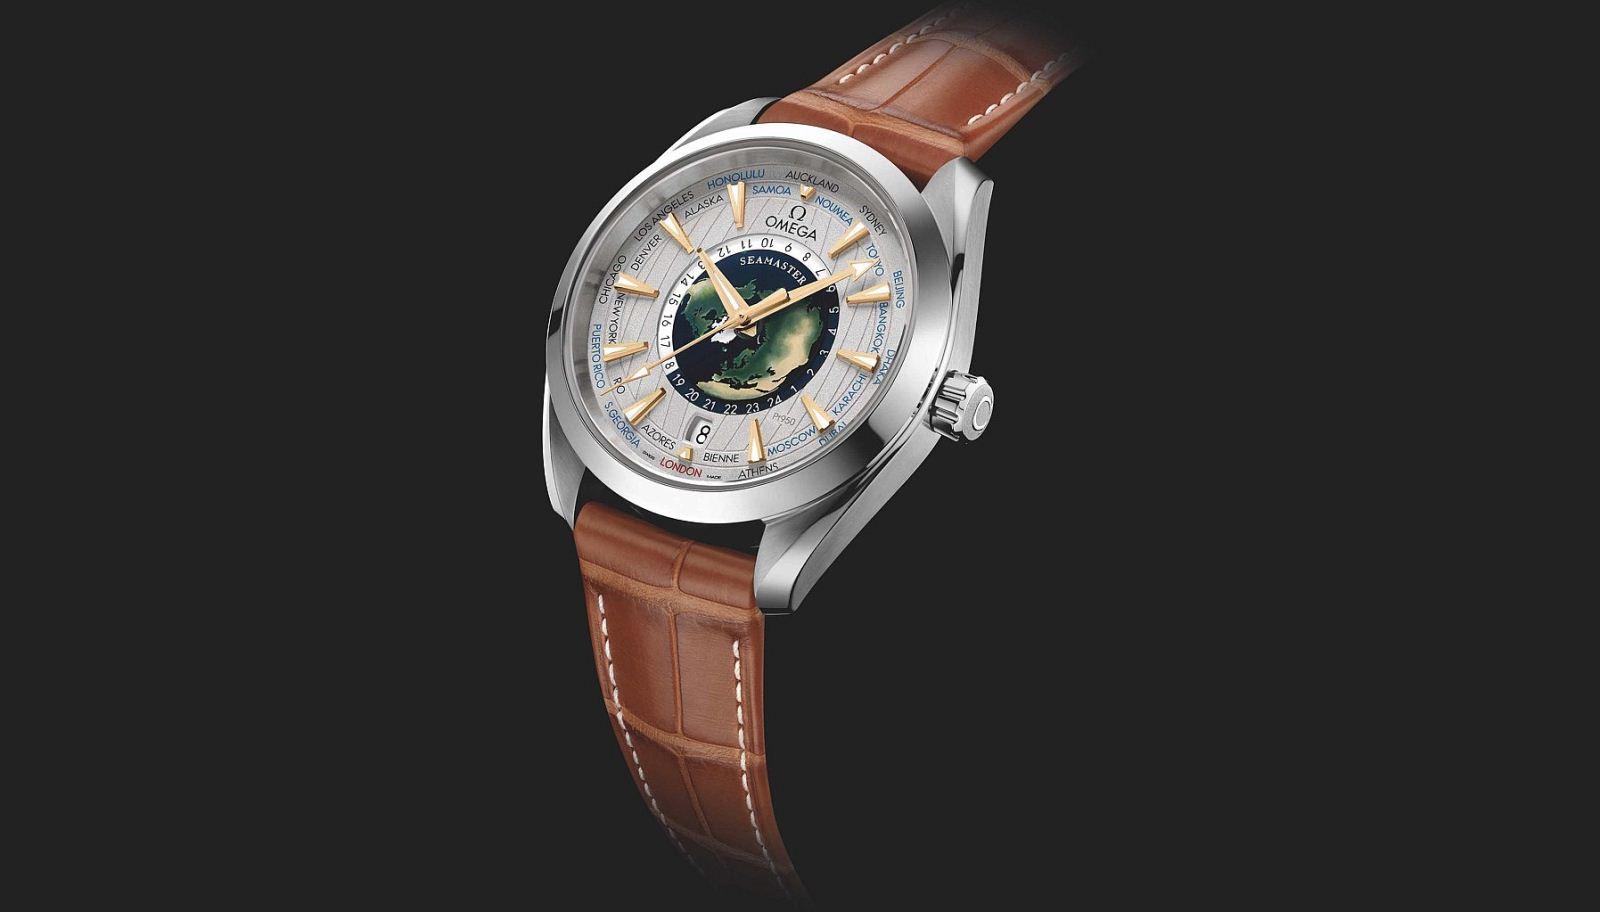 đồng hồ Omega Seamaster Aqua Terra